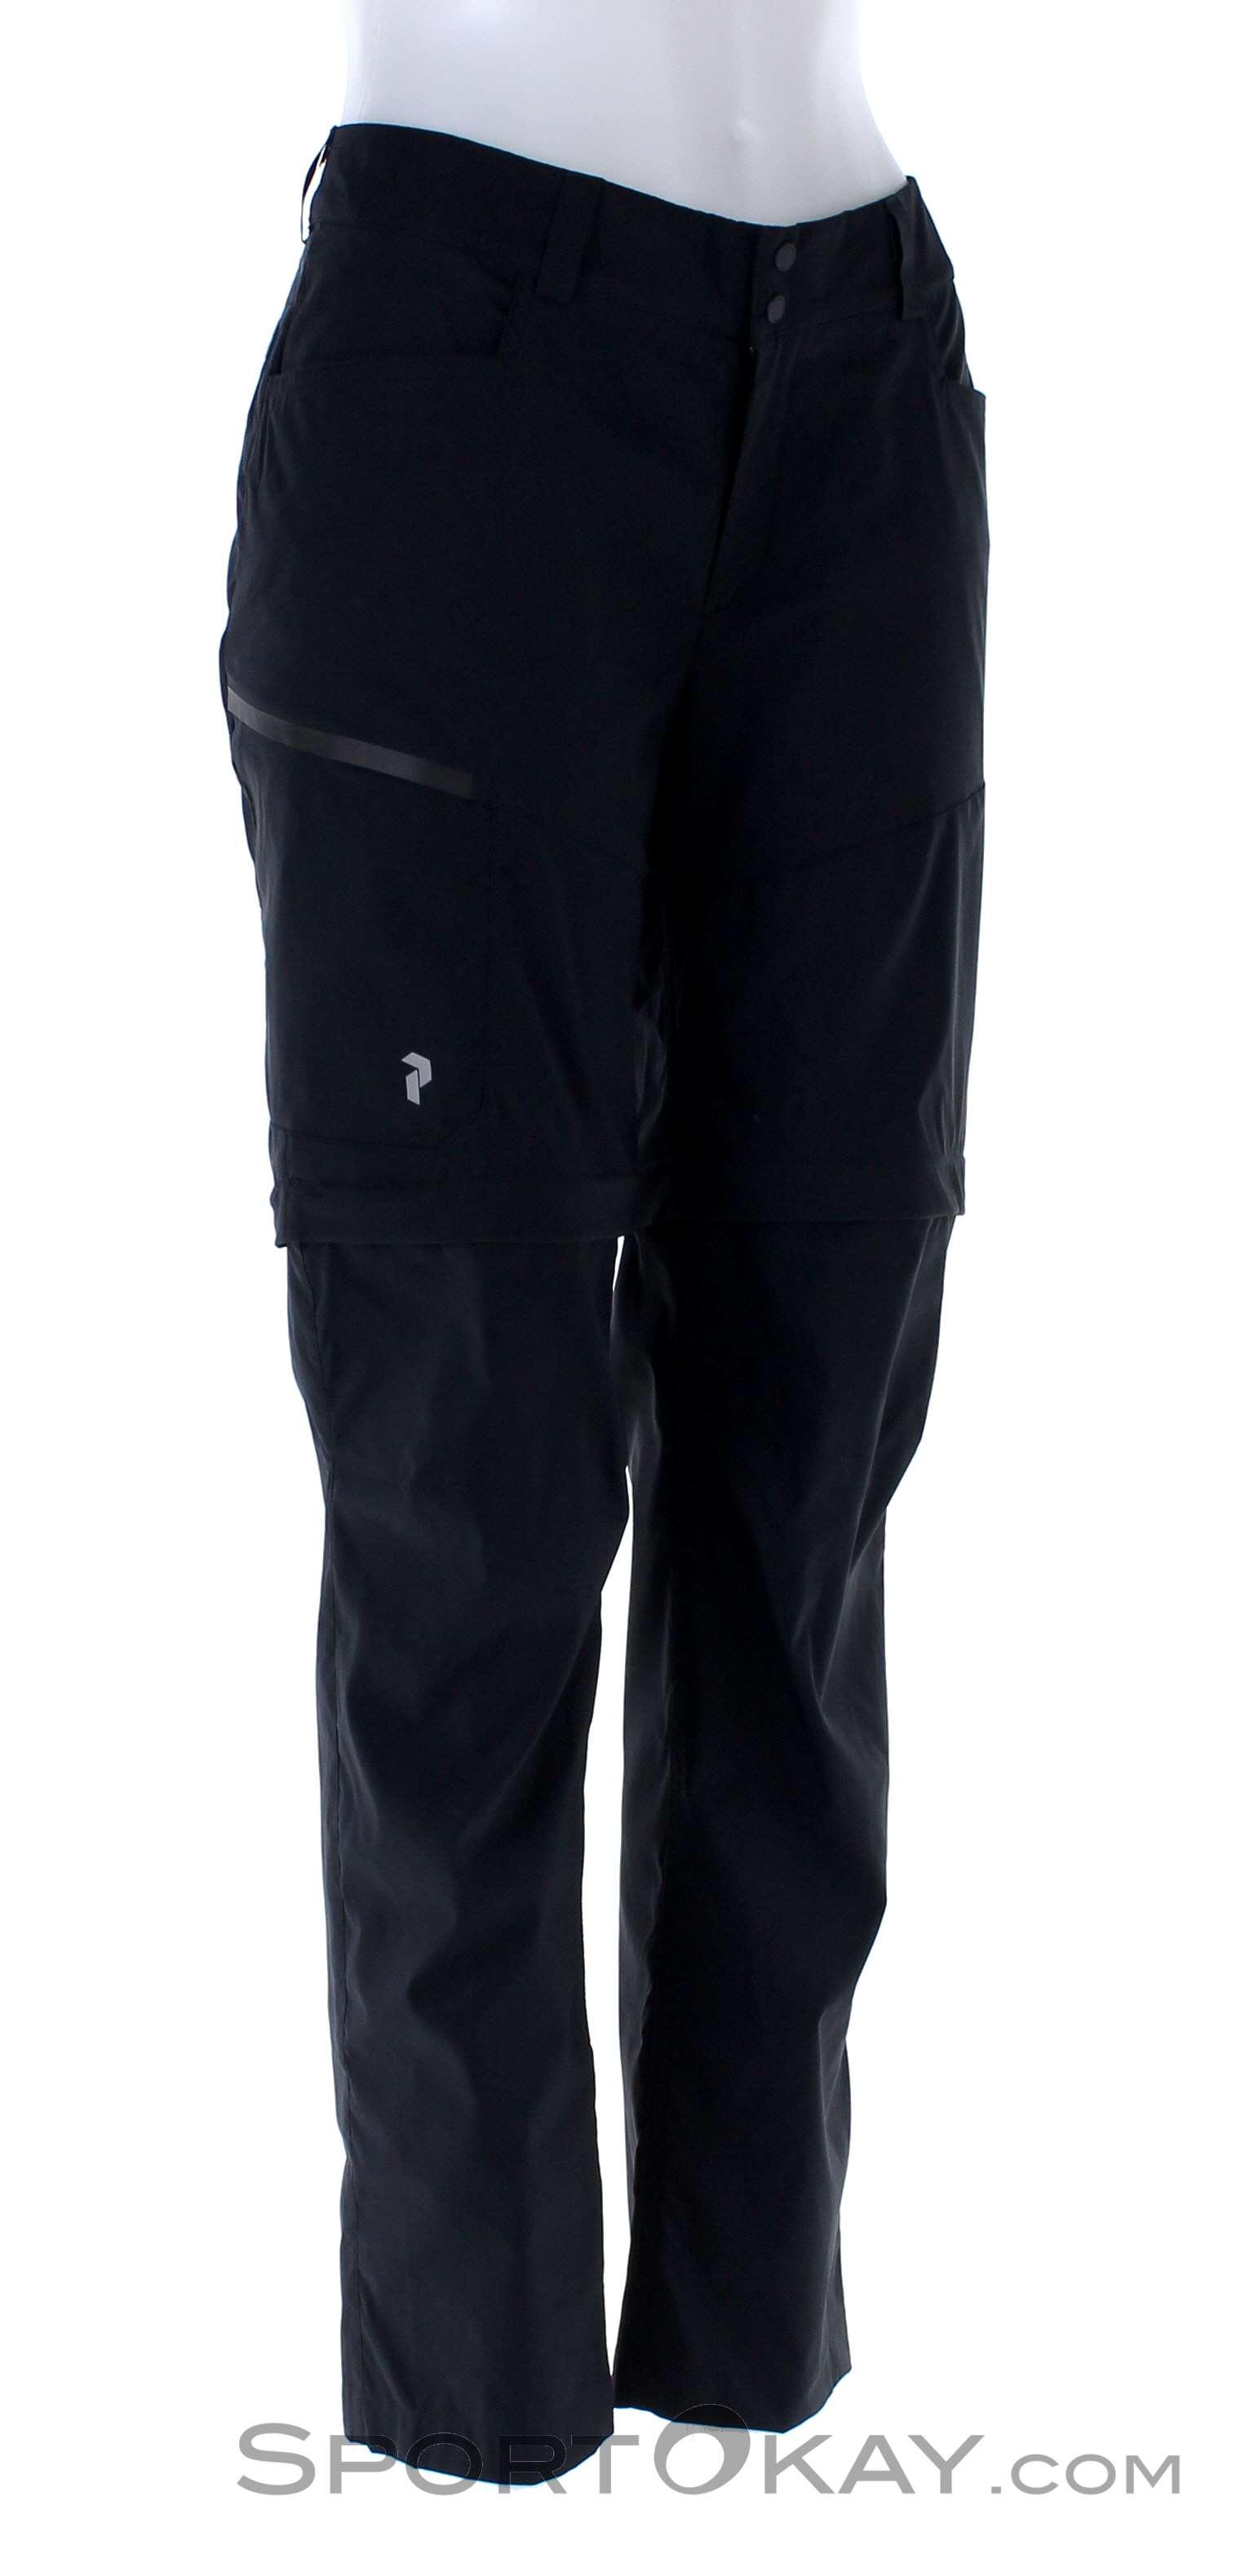 Peak Performance Iconiq Zip Off Pants Womens Outdoor Pants Pants Outdoor Clothing Outdoor All